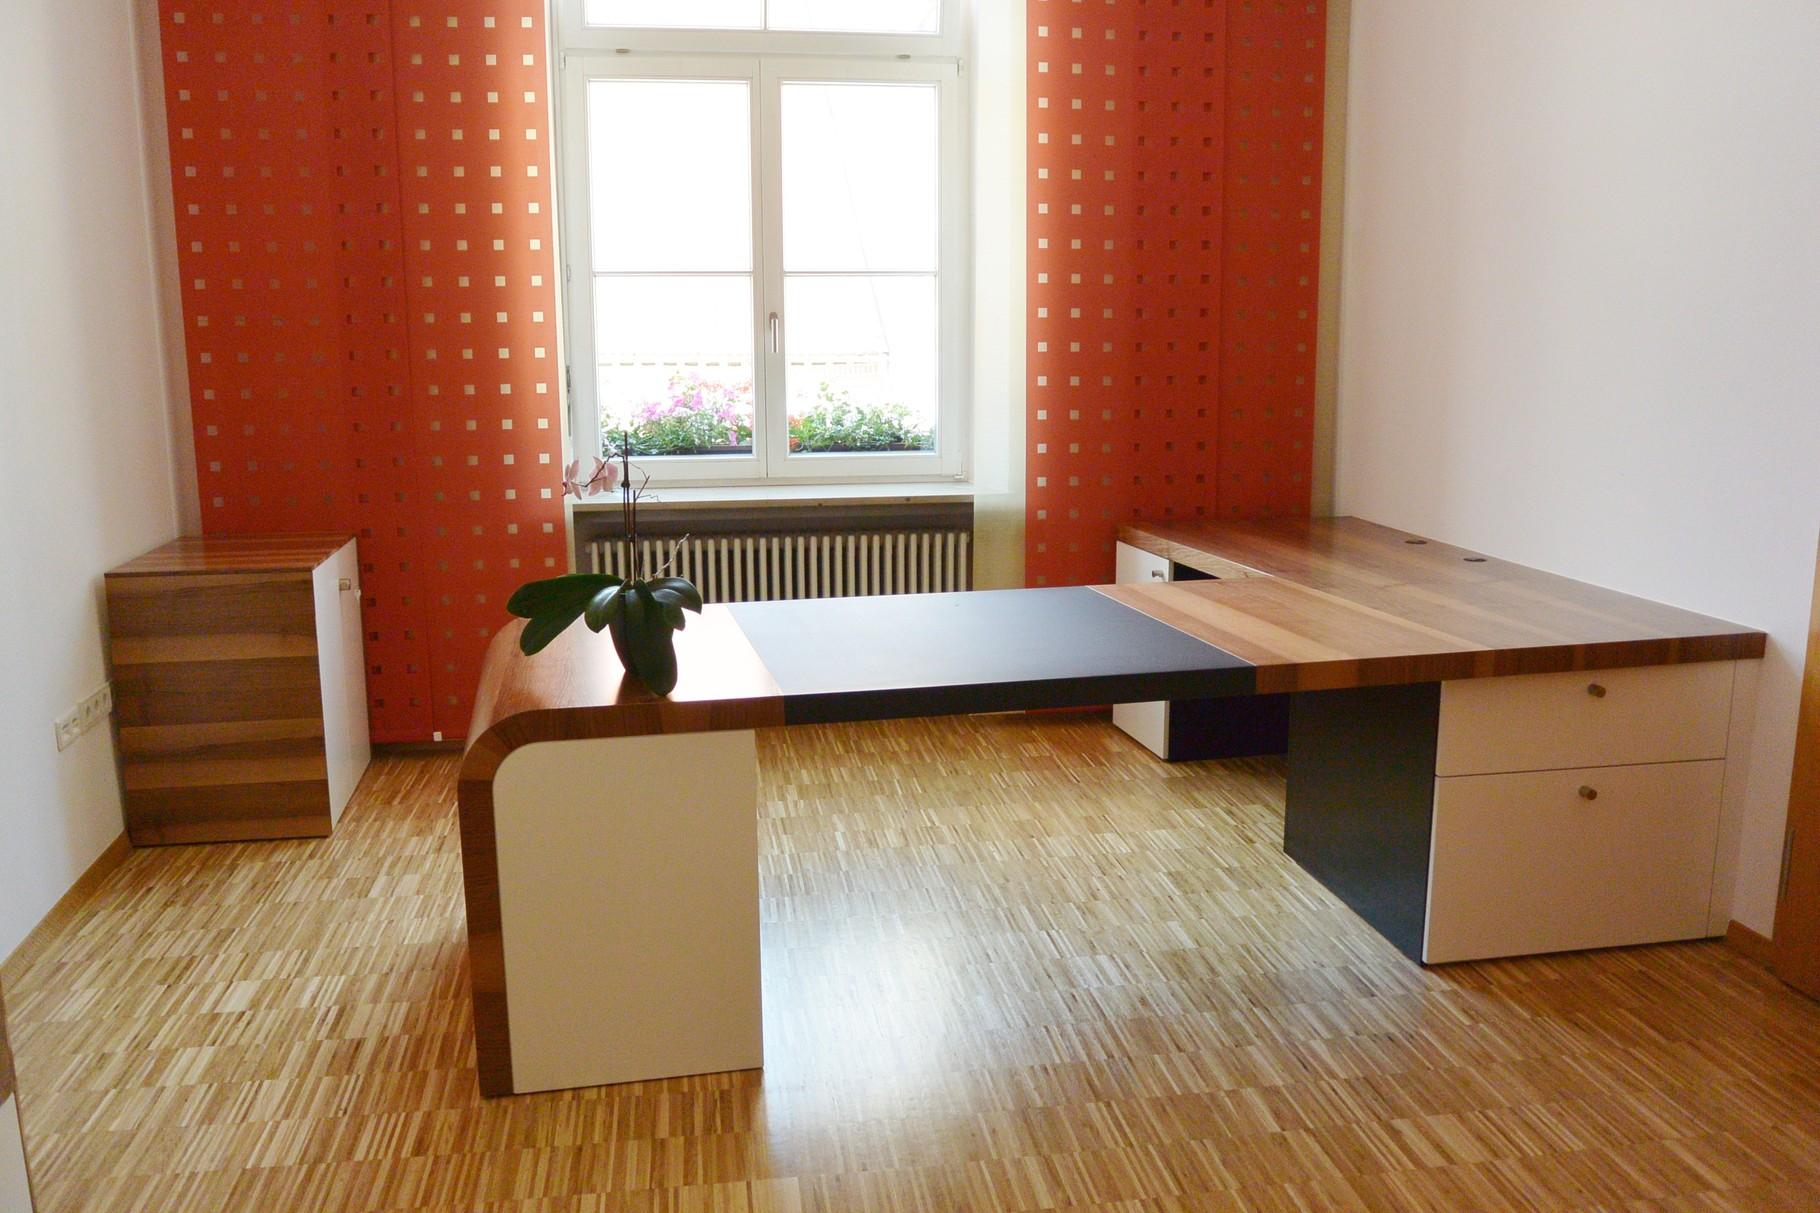 b rom bel in dachschr ge holzdesign rapp geisingen. Black Bedroom Furniture Sets. Home Design Ideas